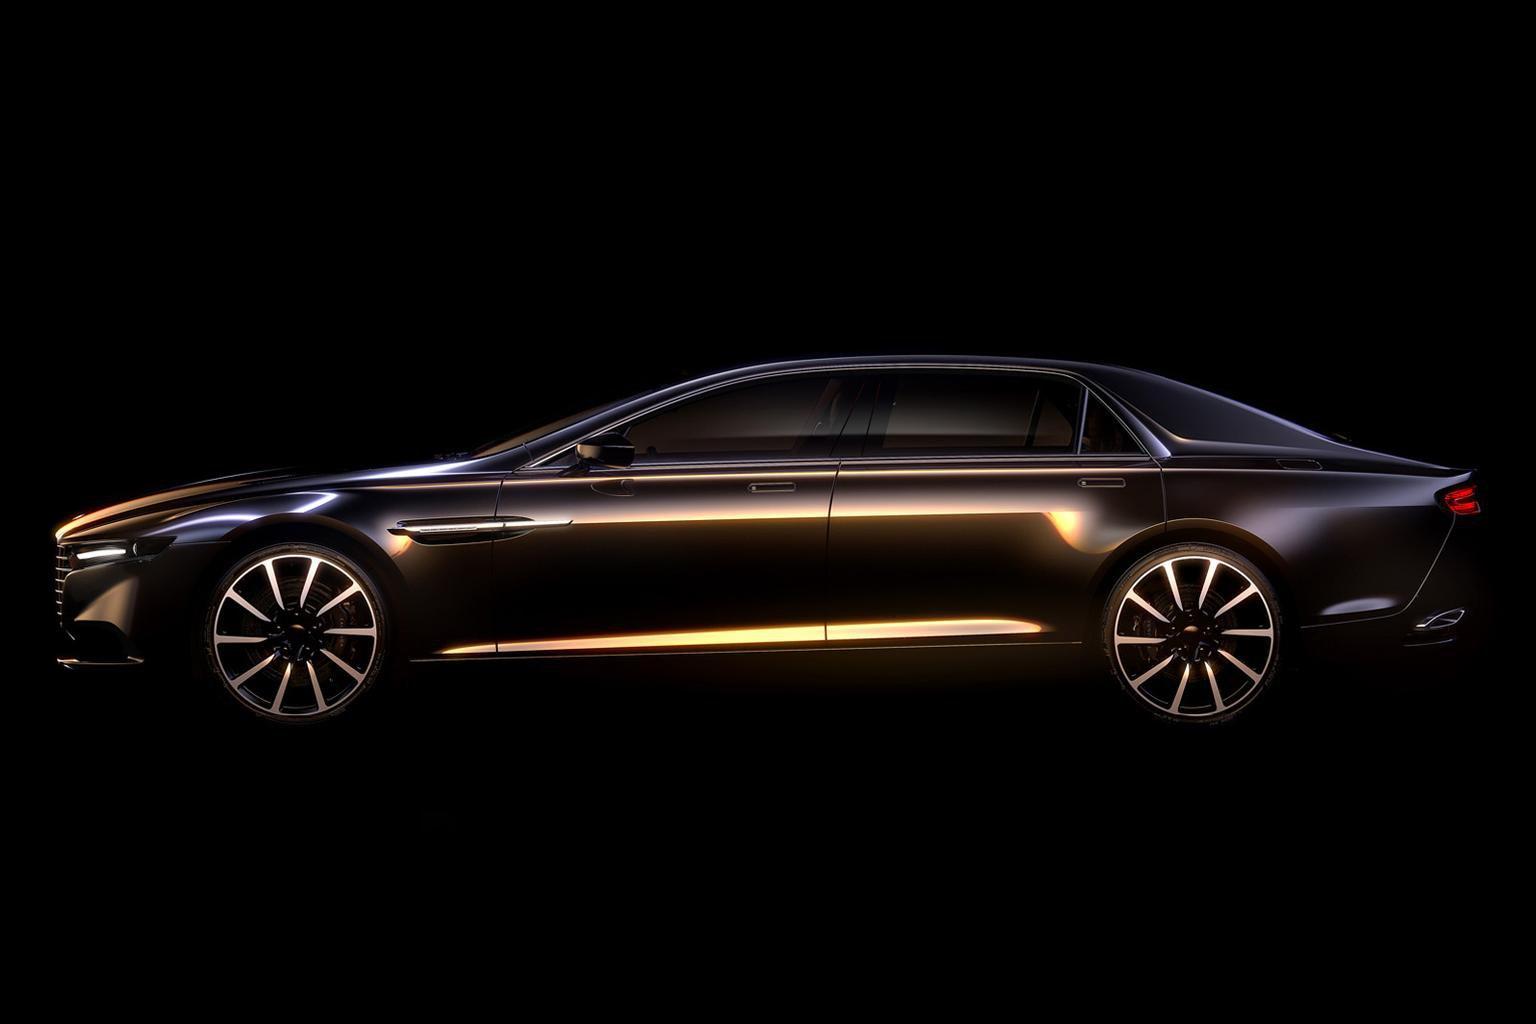 News round-up: Aston Martin Lagonda name returns, and new AMG engine revealed